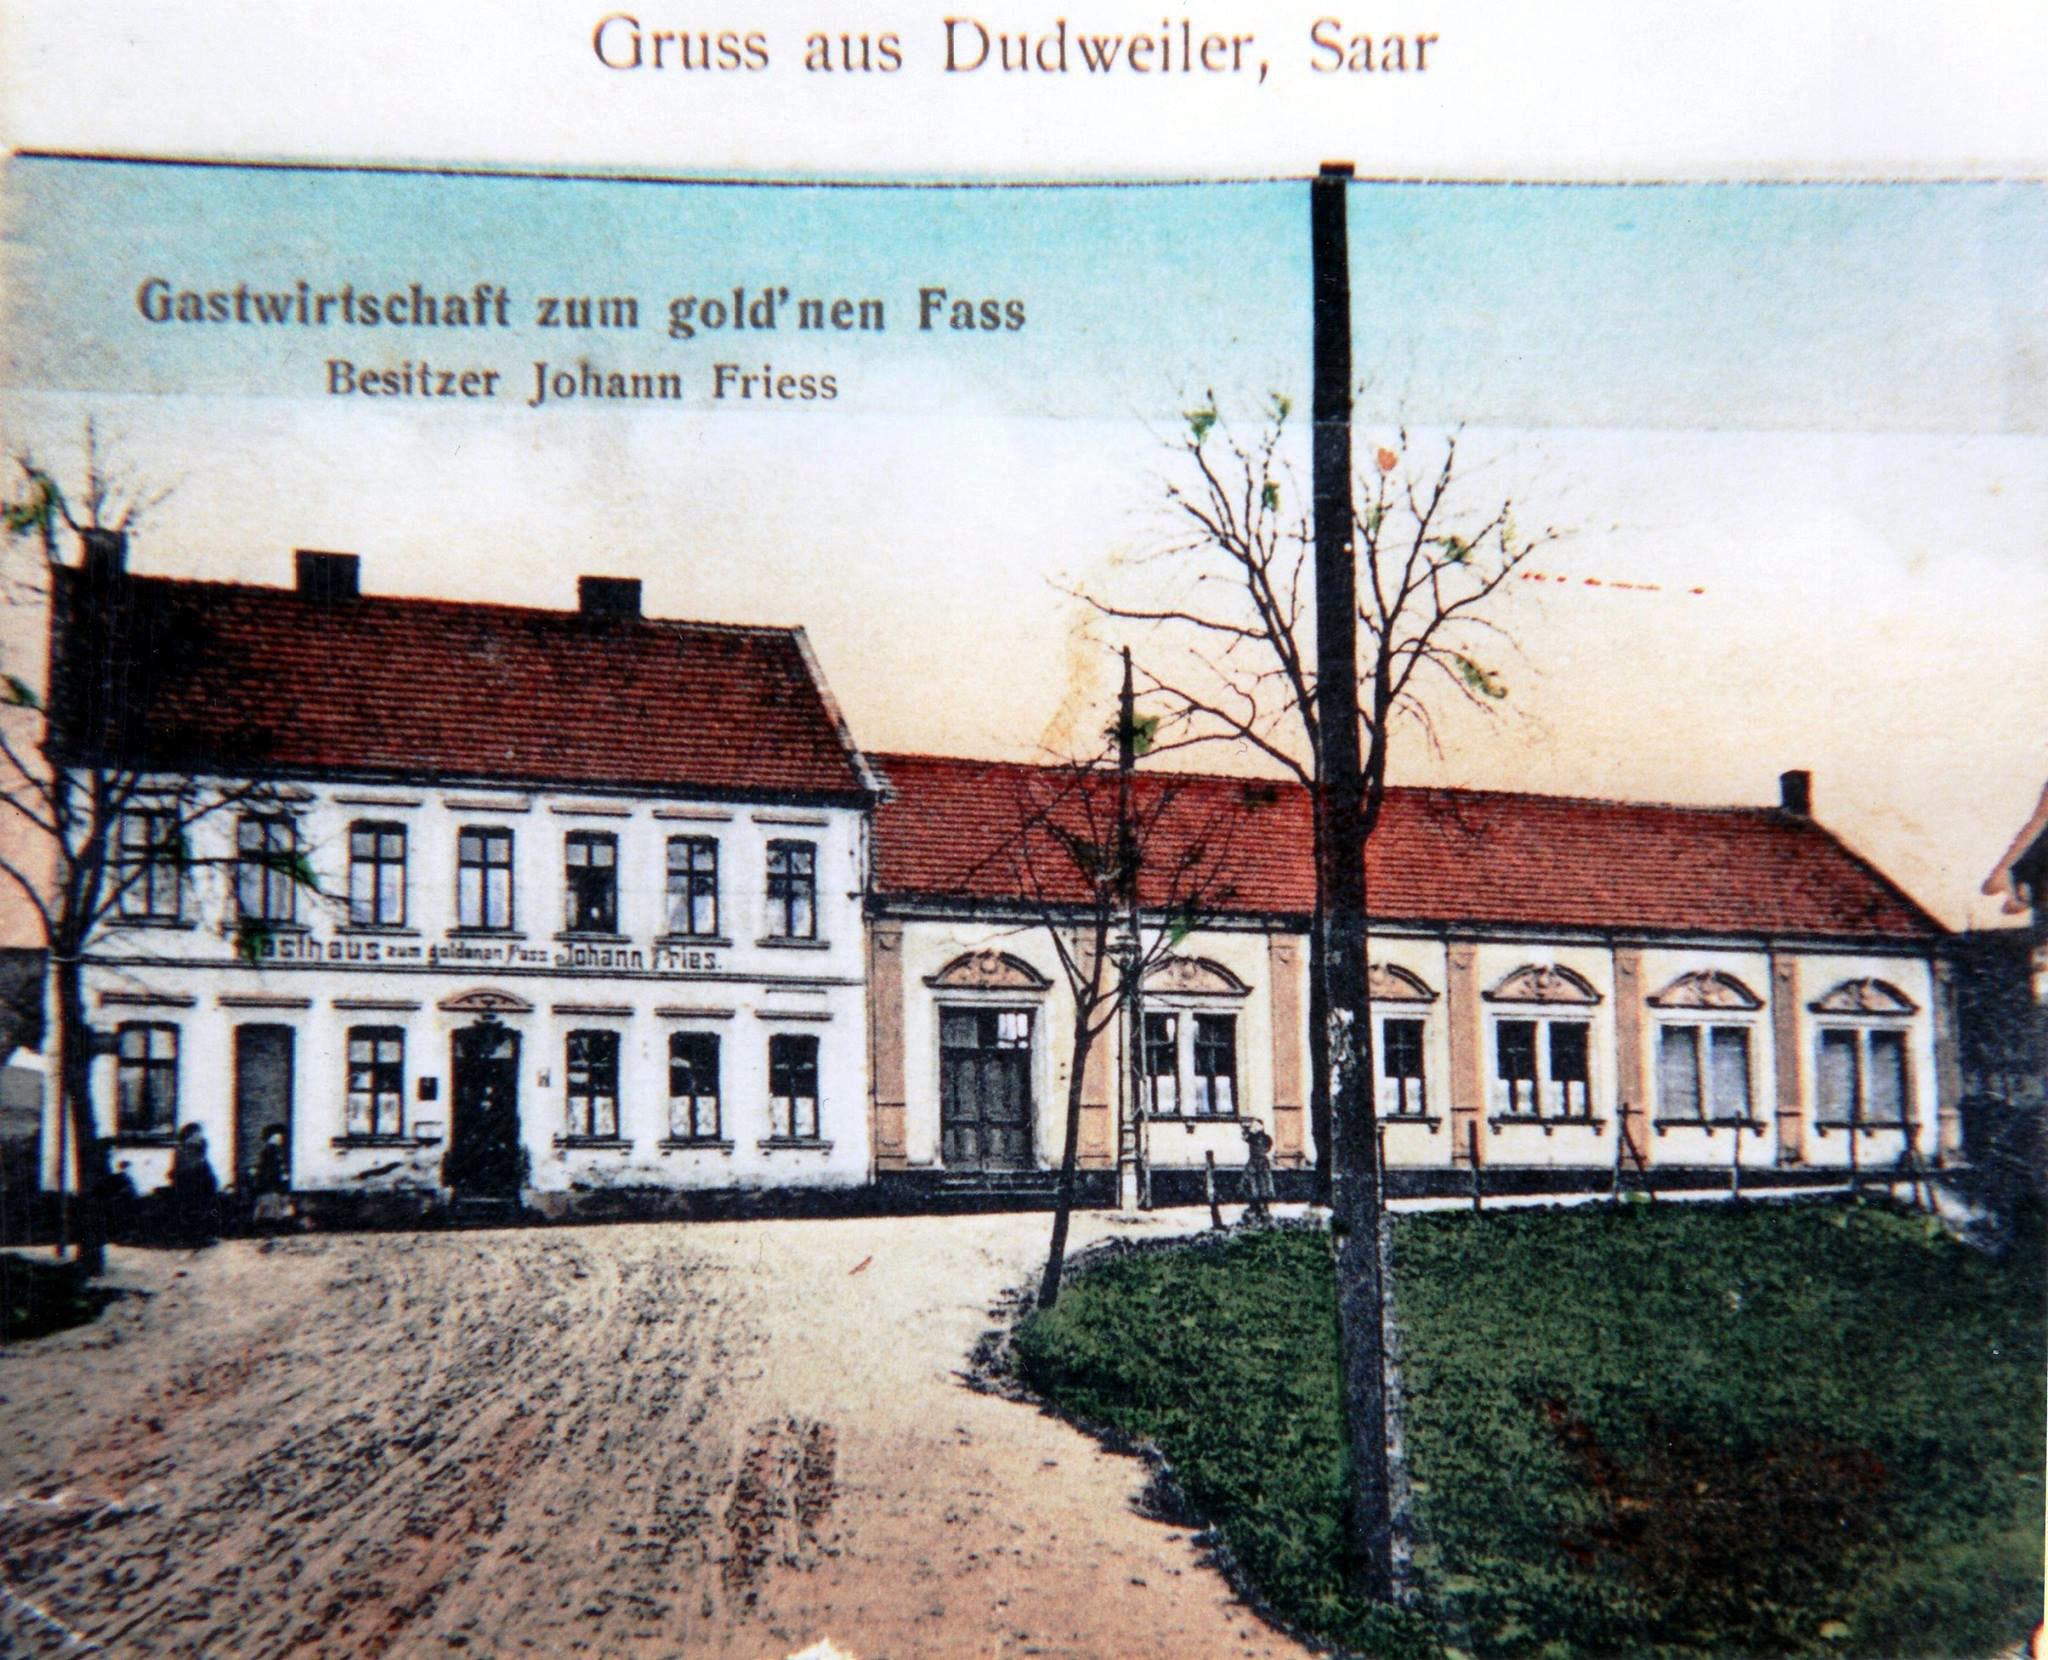 Gasthaus Zum goldenen Fass um 1910, Ecke Herrensohrer Weg, heute Robine